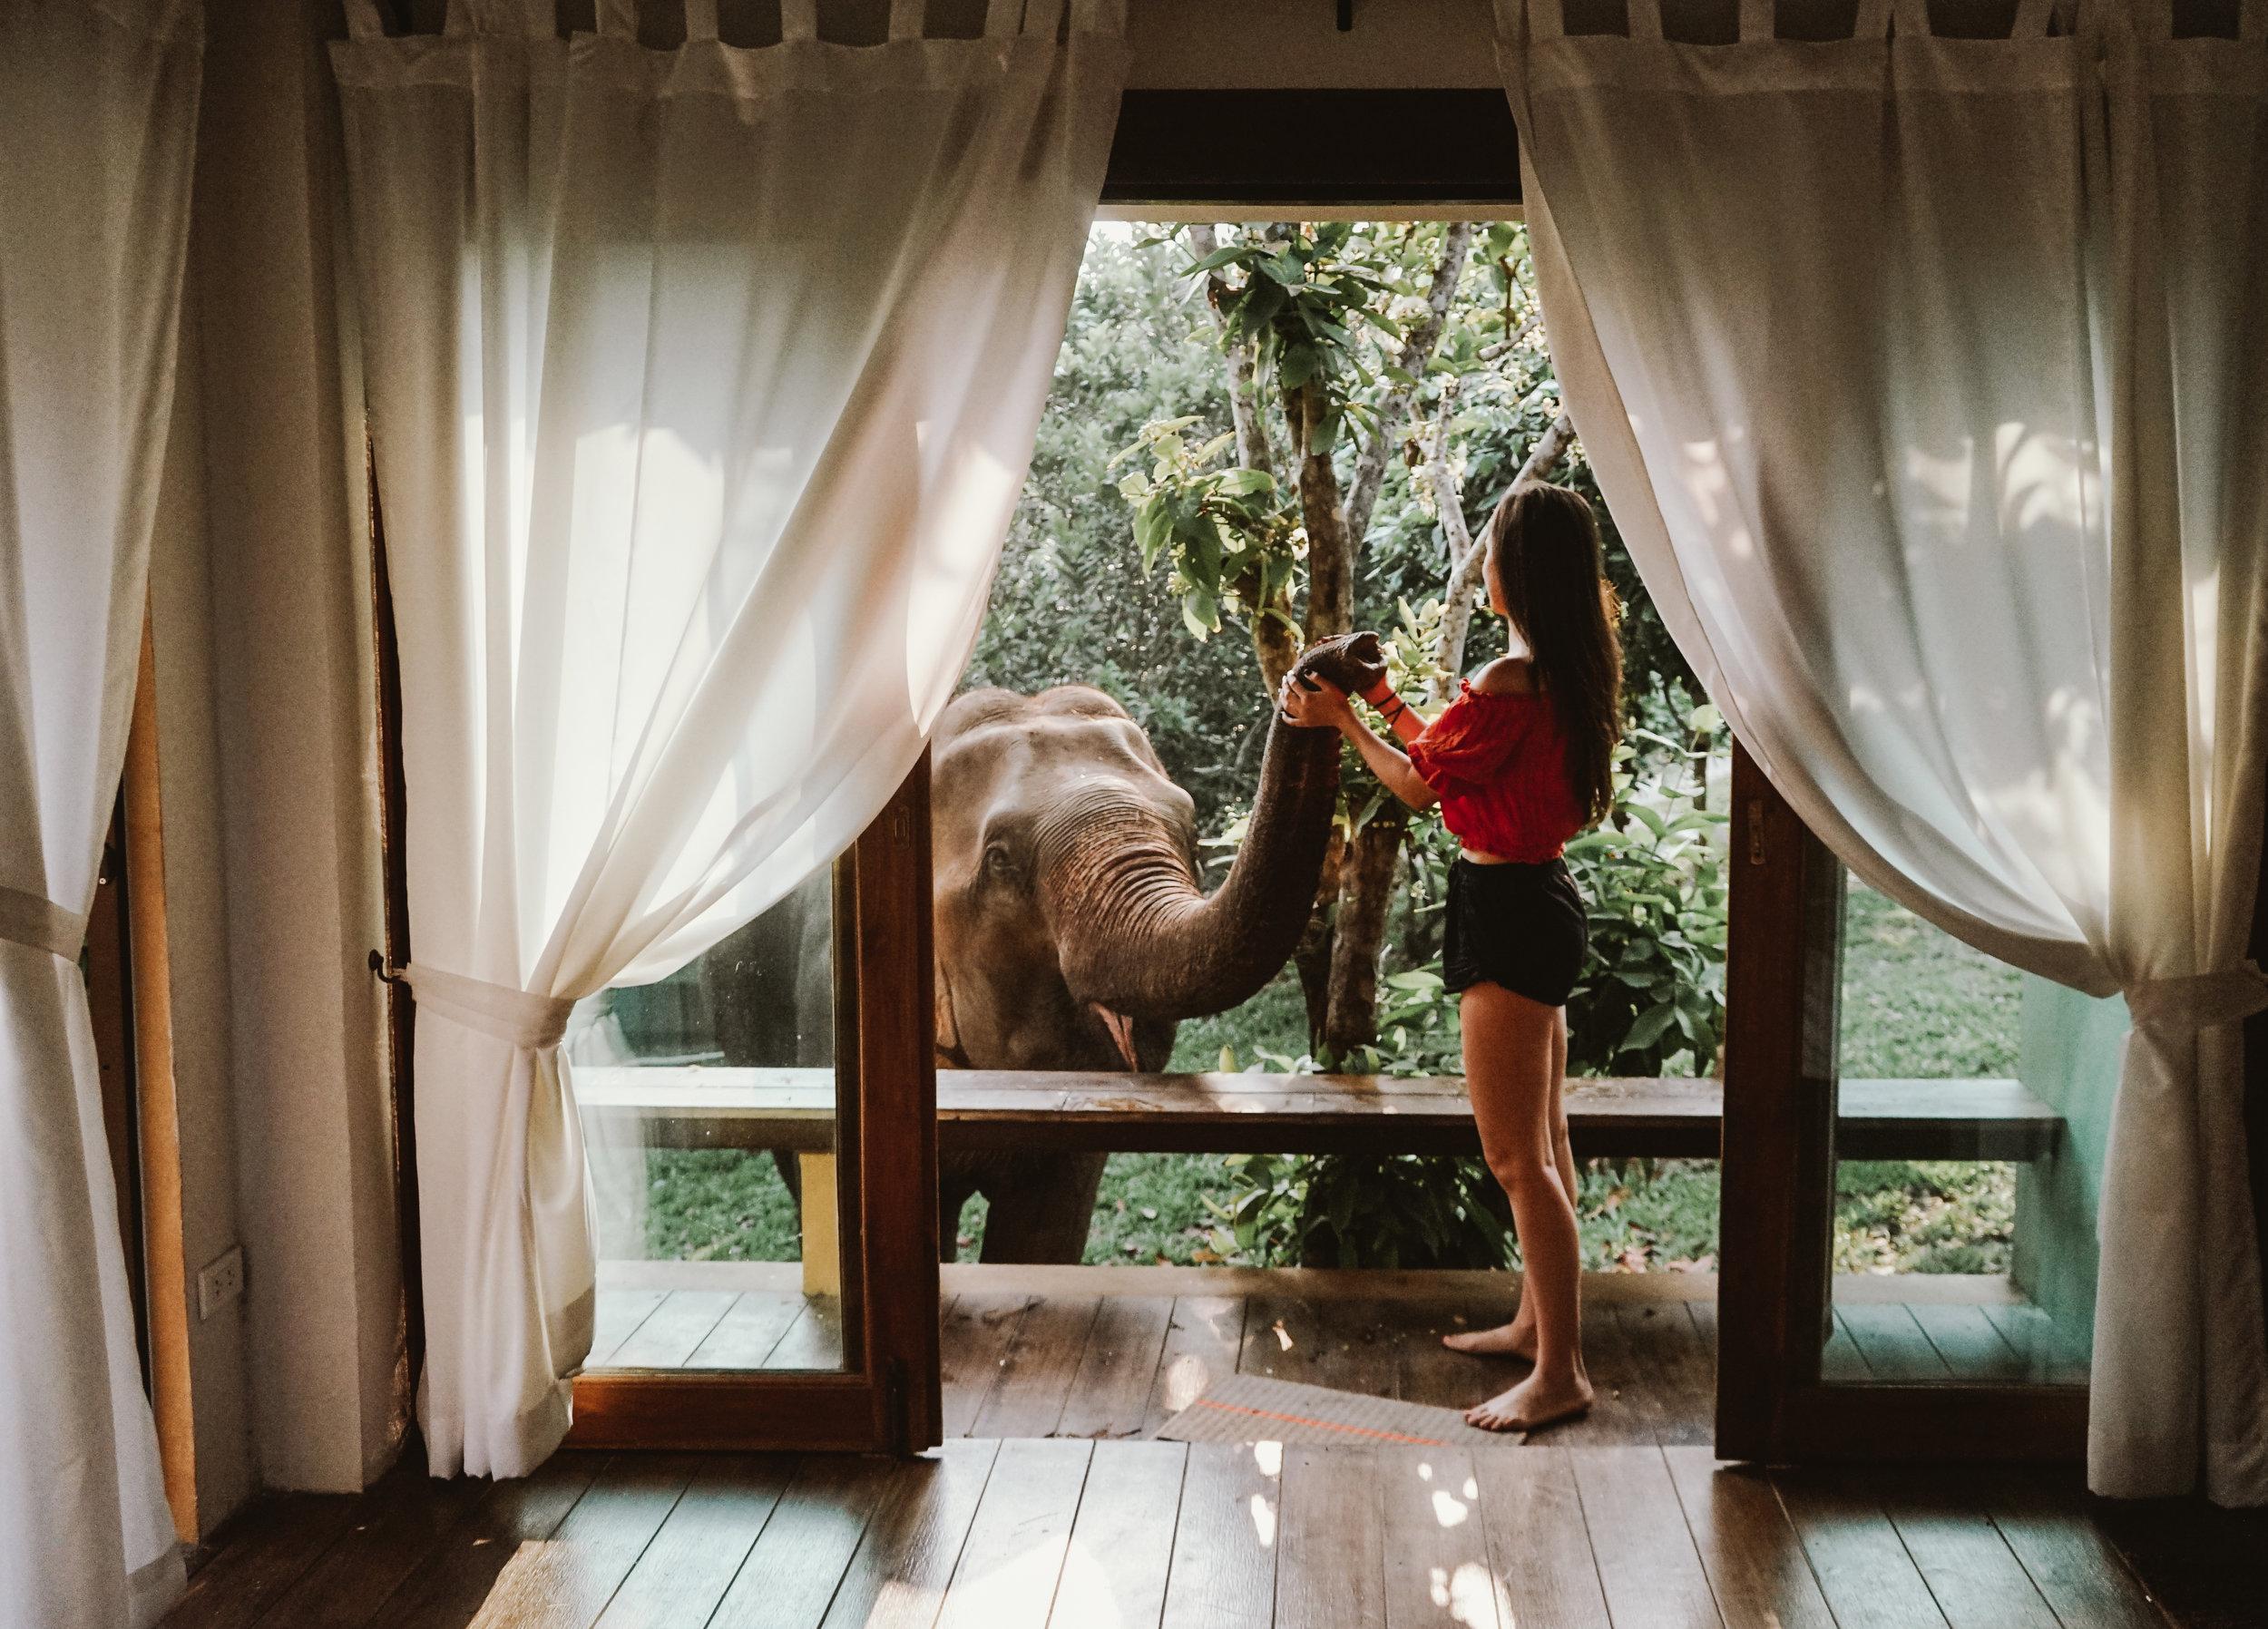 Bungalow Patio with Elephant